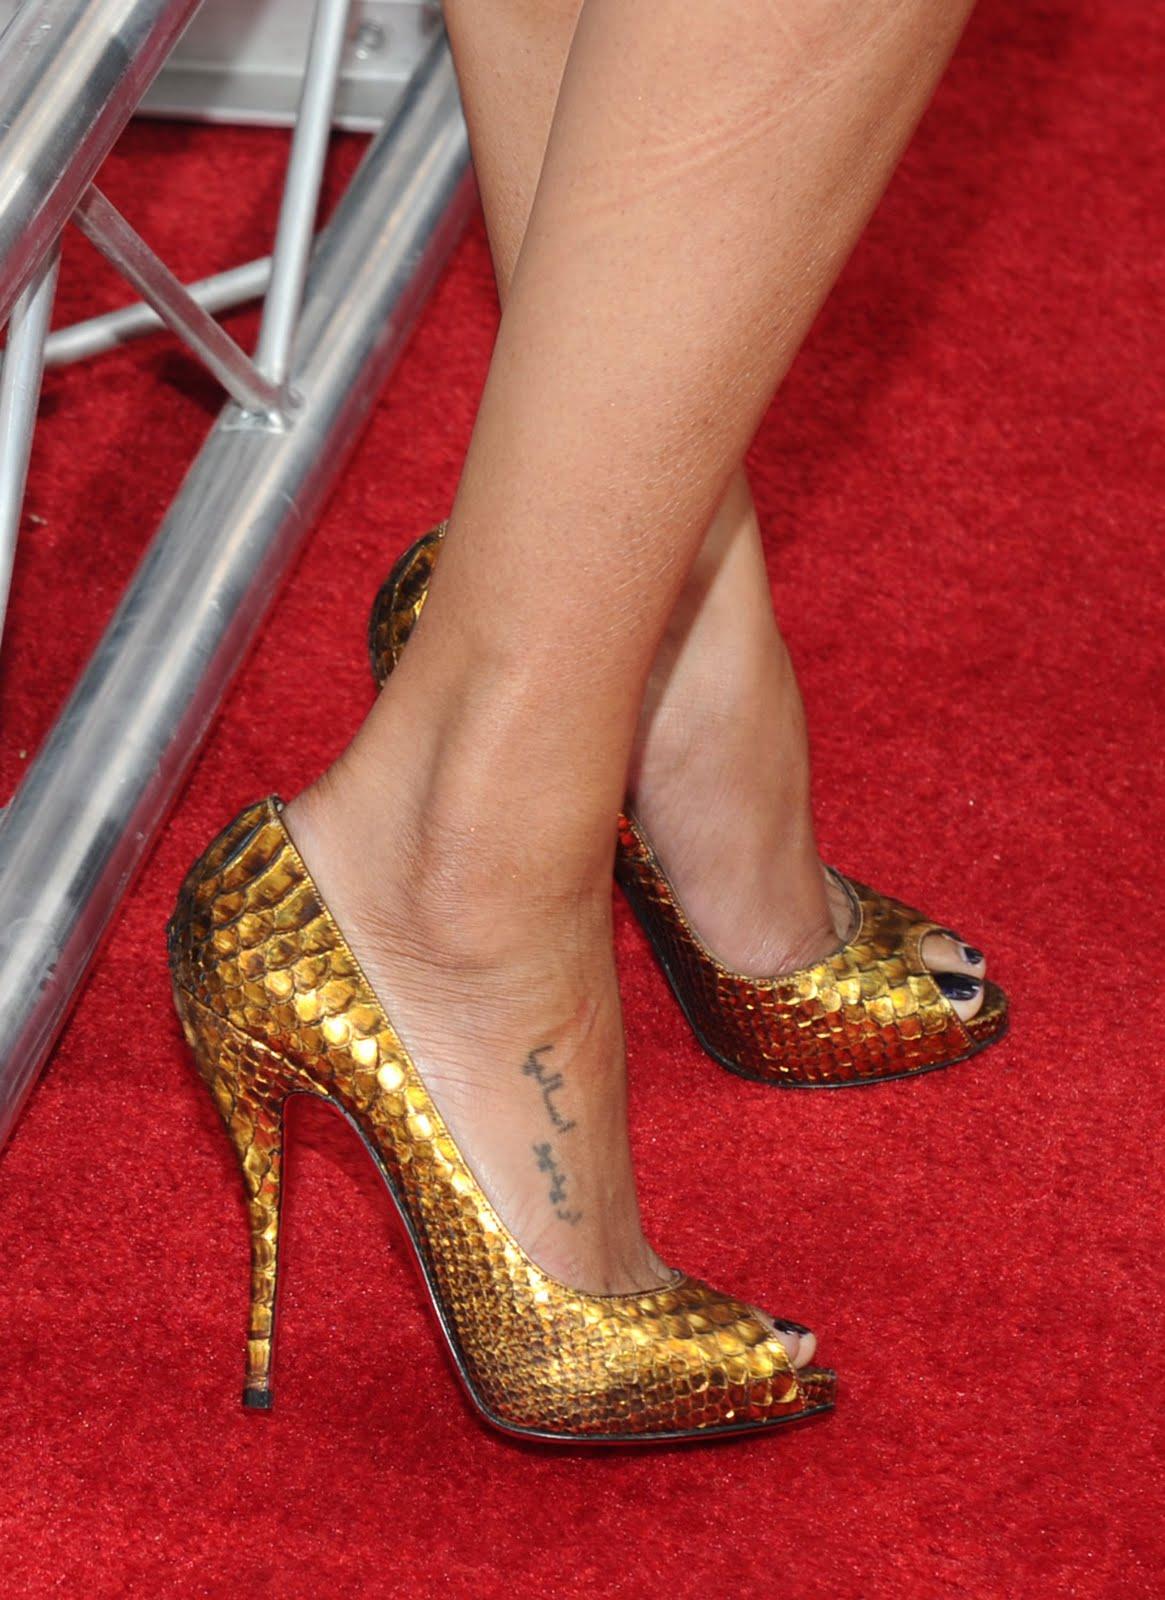 zoe-saldana-feet-5 jpgZoe Saldana Feet